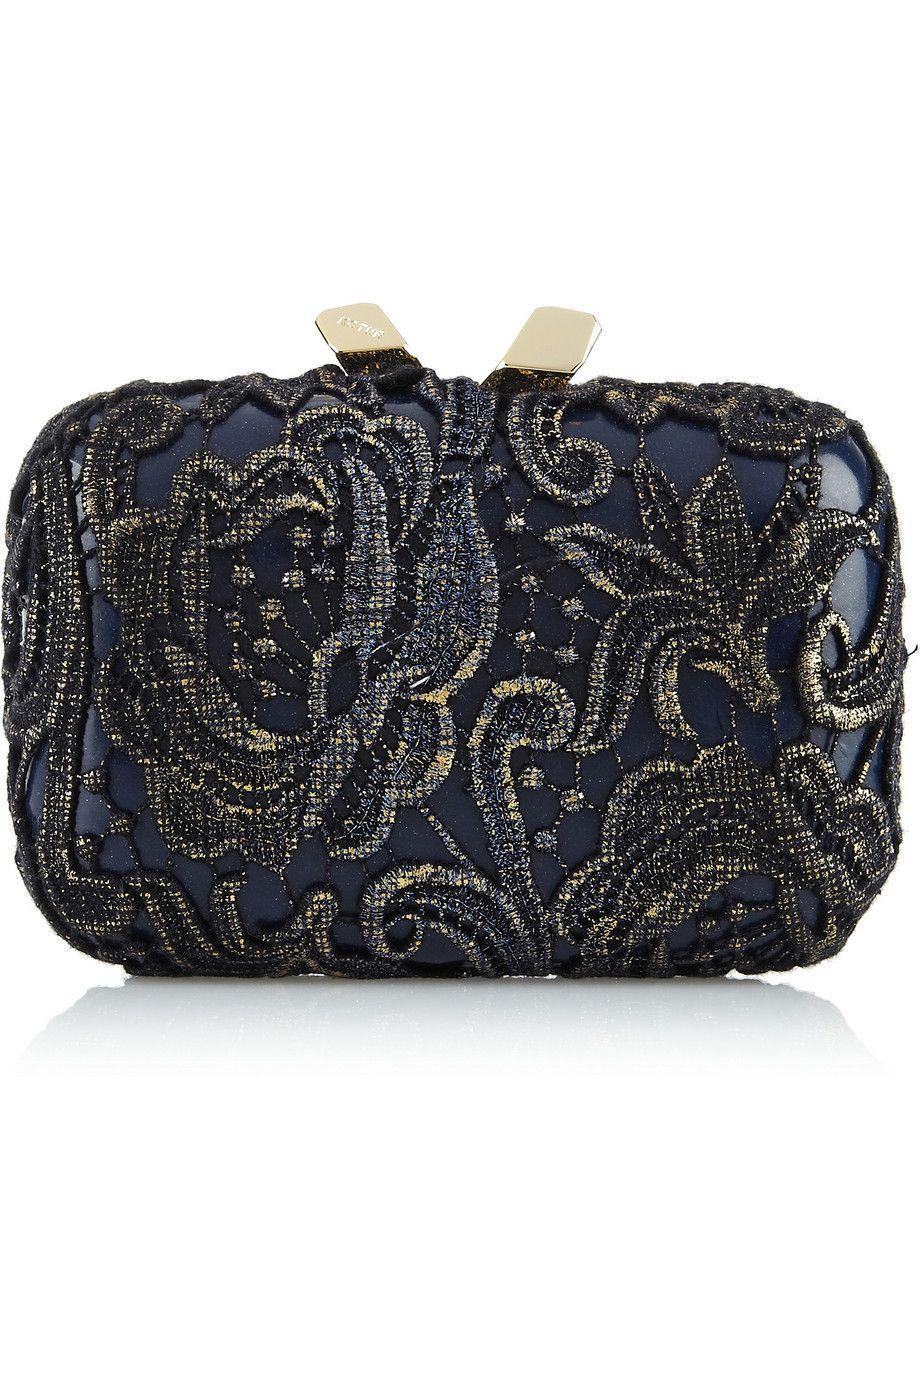 Kotur lace-covered patent box clutch